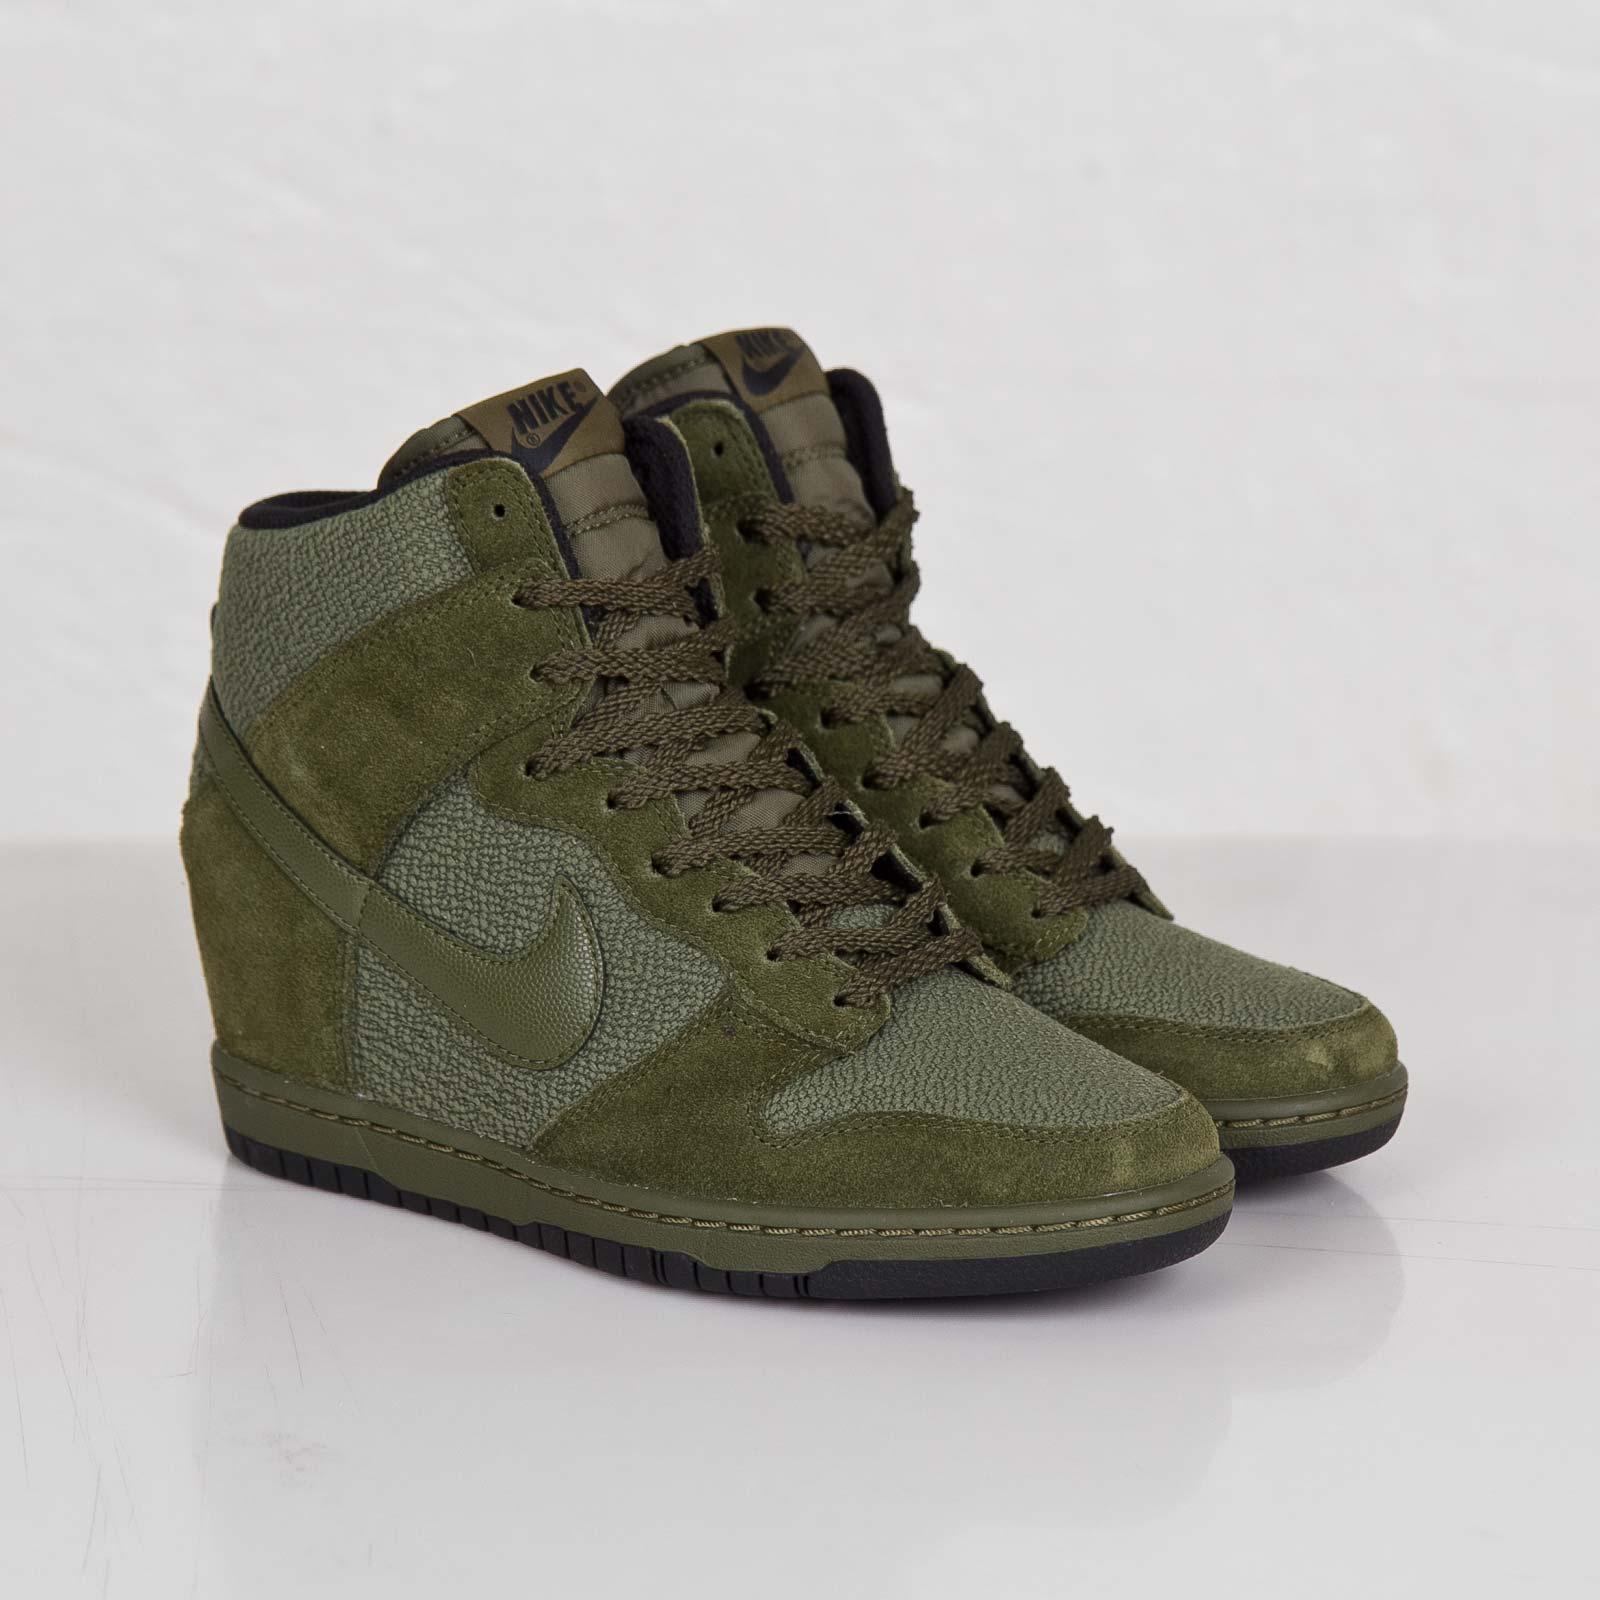 6c8c0bf205465 Nike Wmns Dunk Sky Hi Essential - 644877-302 - Sneakersnstuff ...